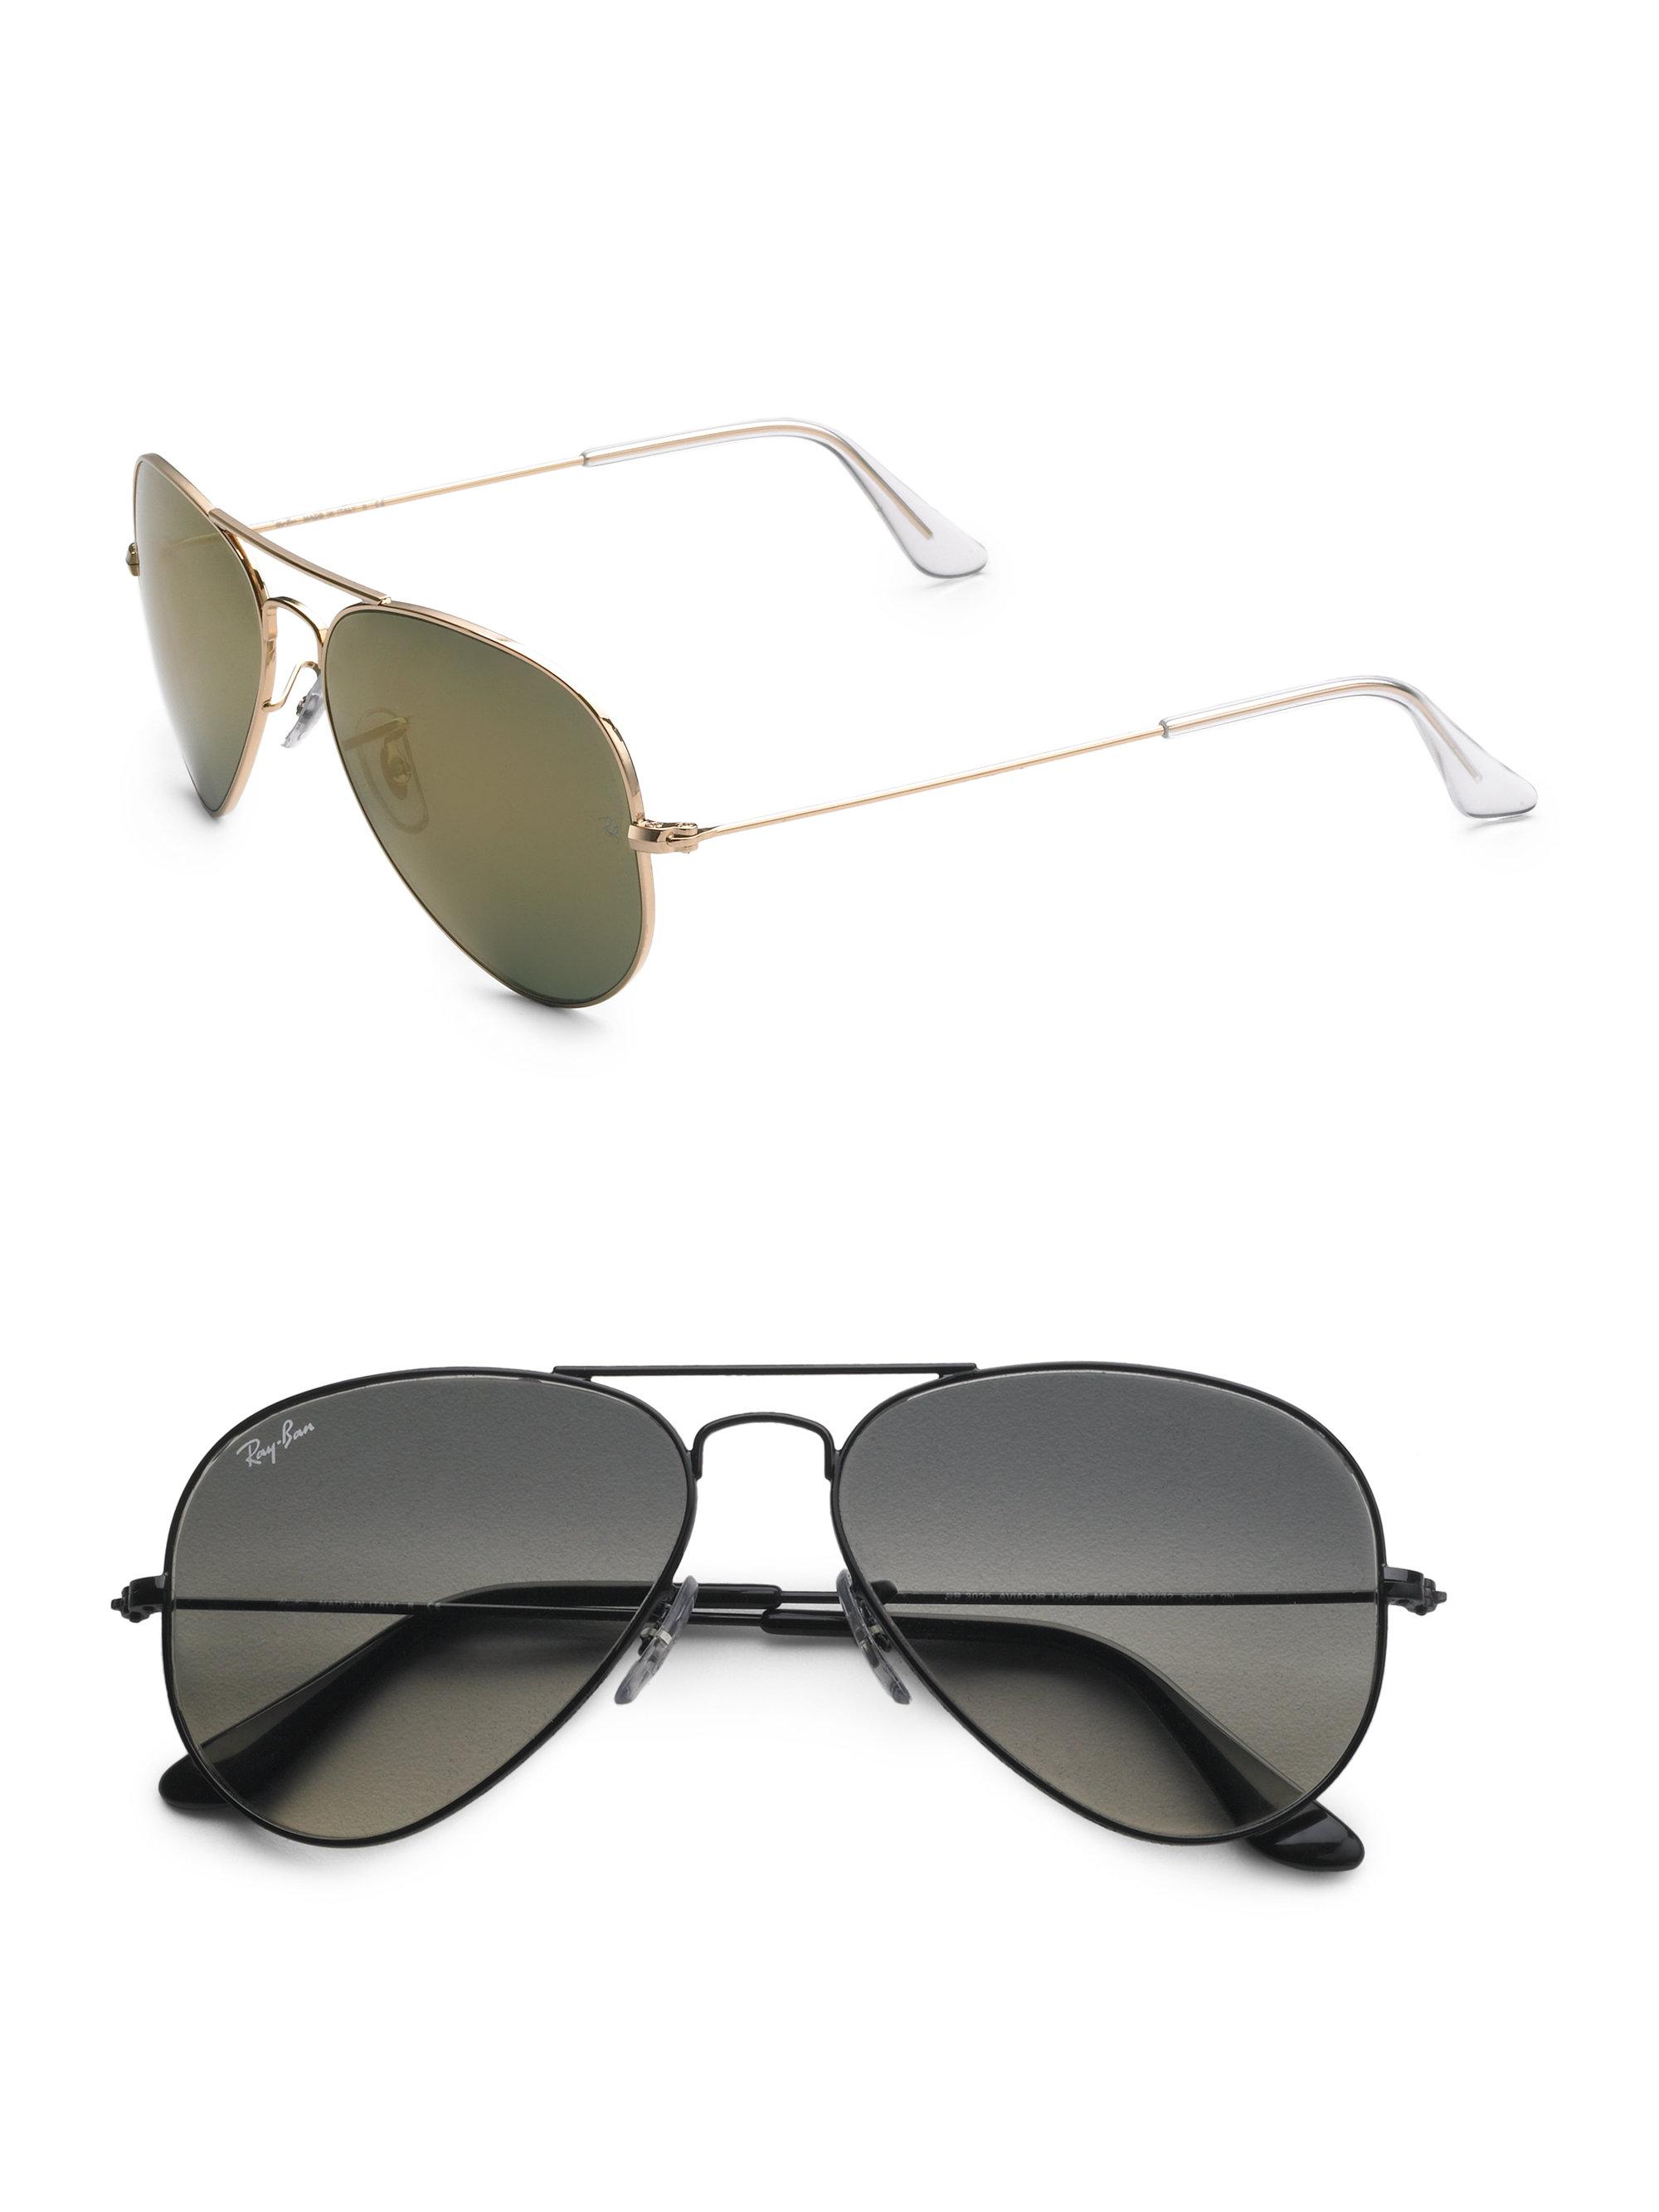 ray ban aviator sunglasses in silver for men silver. Black Bedroom Furniture Sets. Home Design Ideas